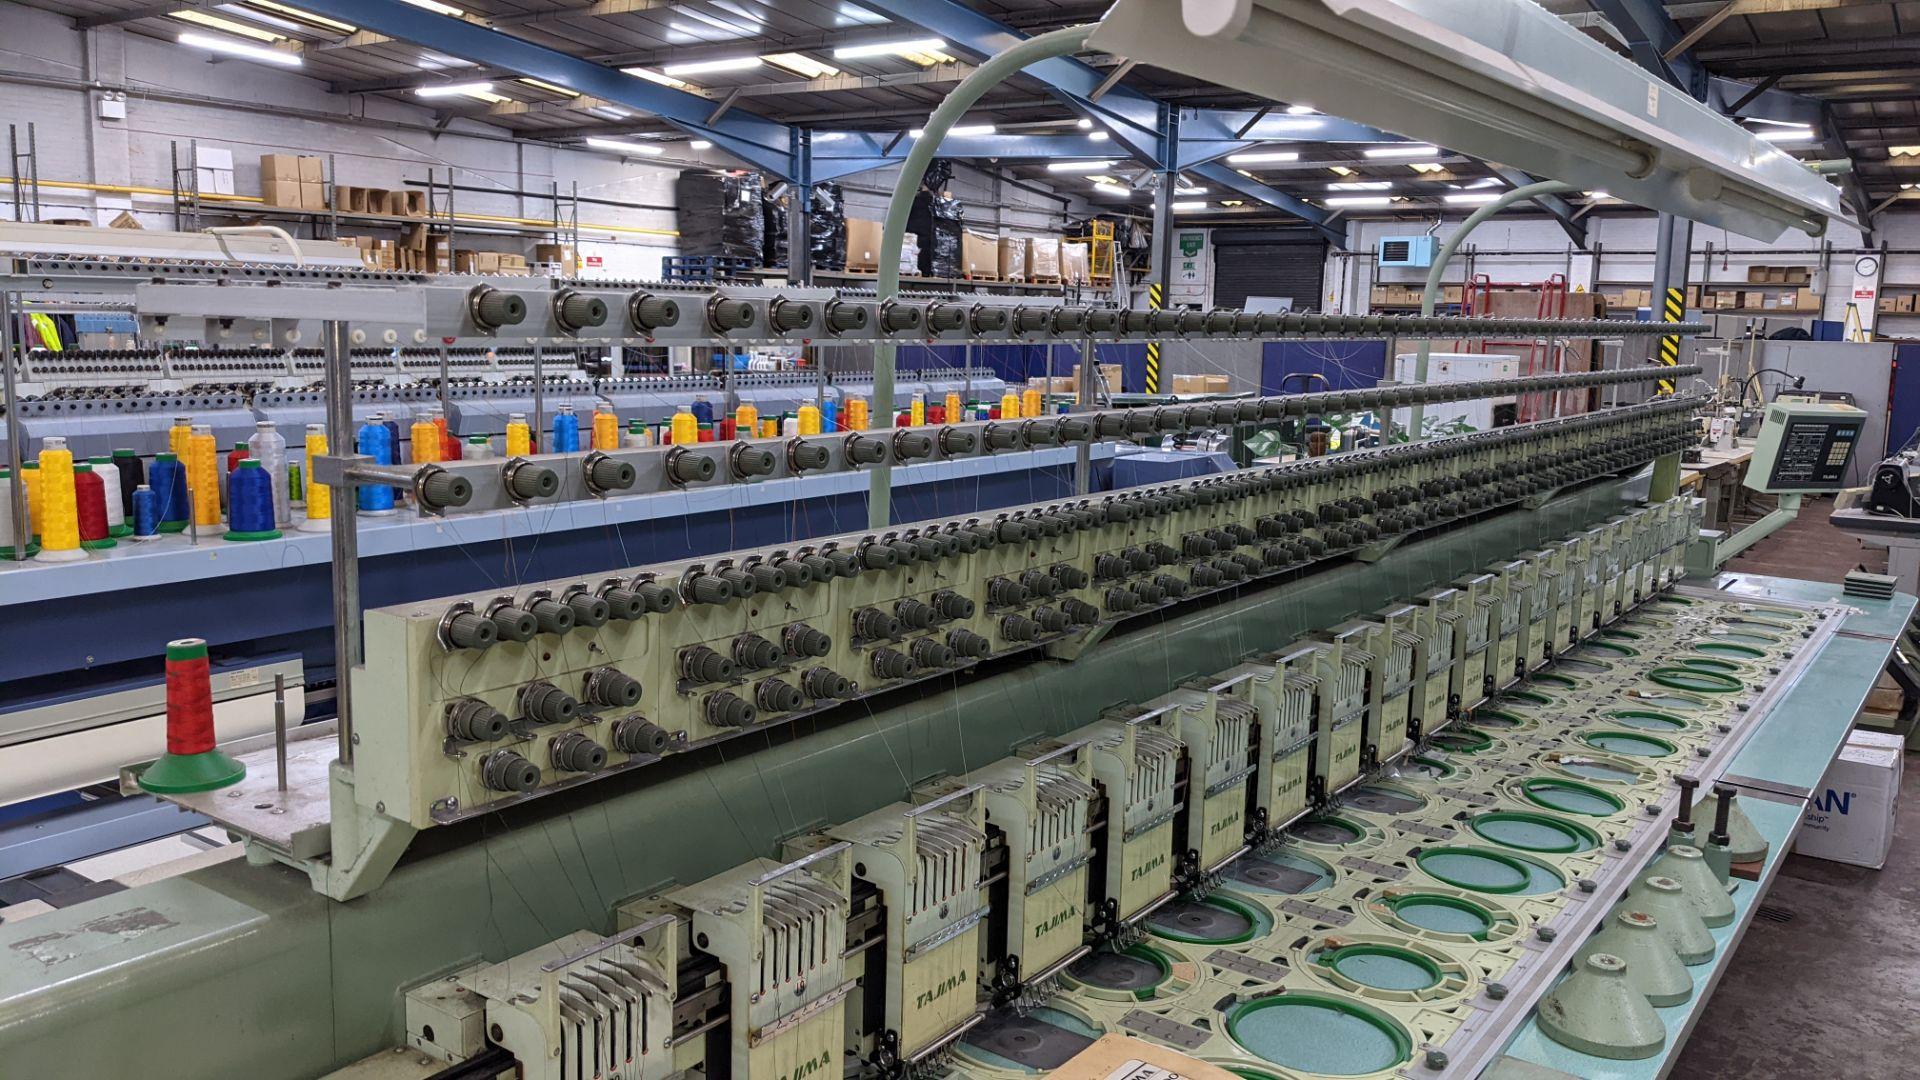 Tokai Tajima electronic 20 head automatic embroidery machine model TMEF-H620 - Image 12 of 25